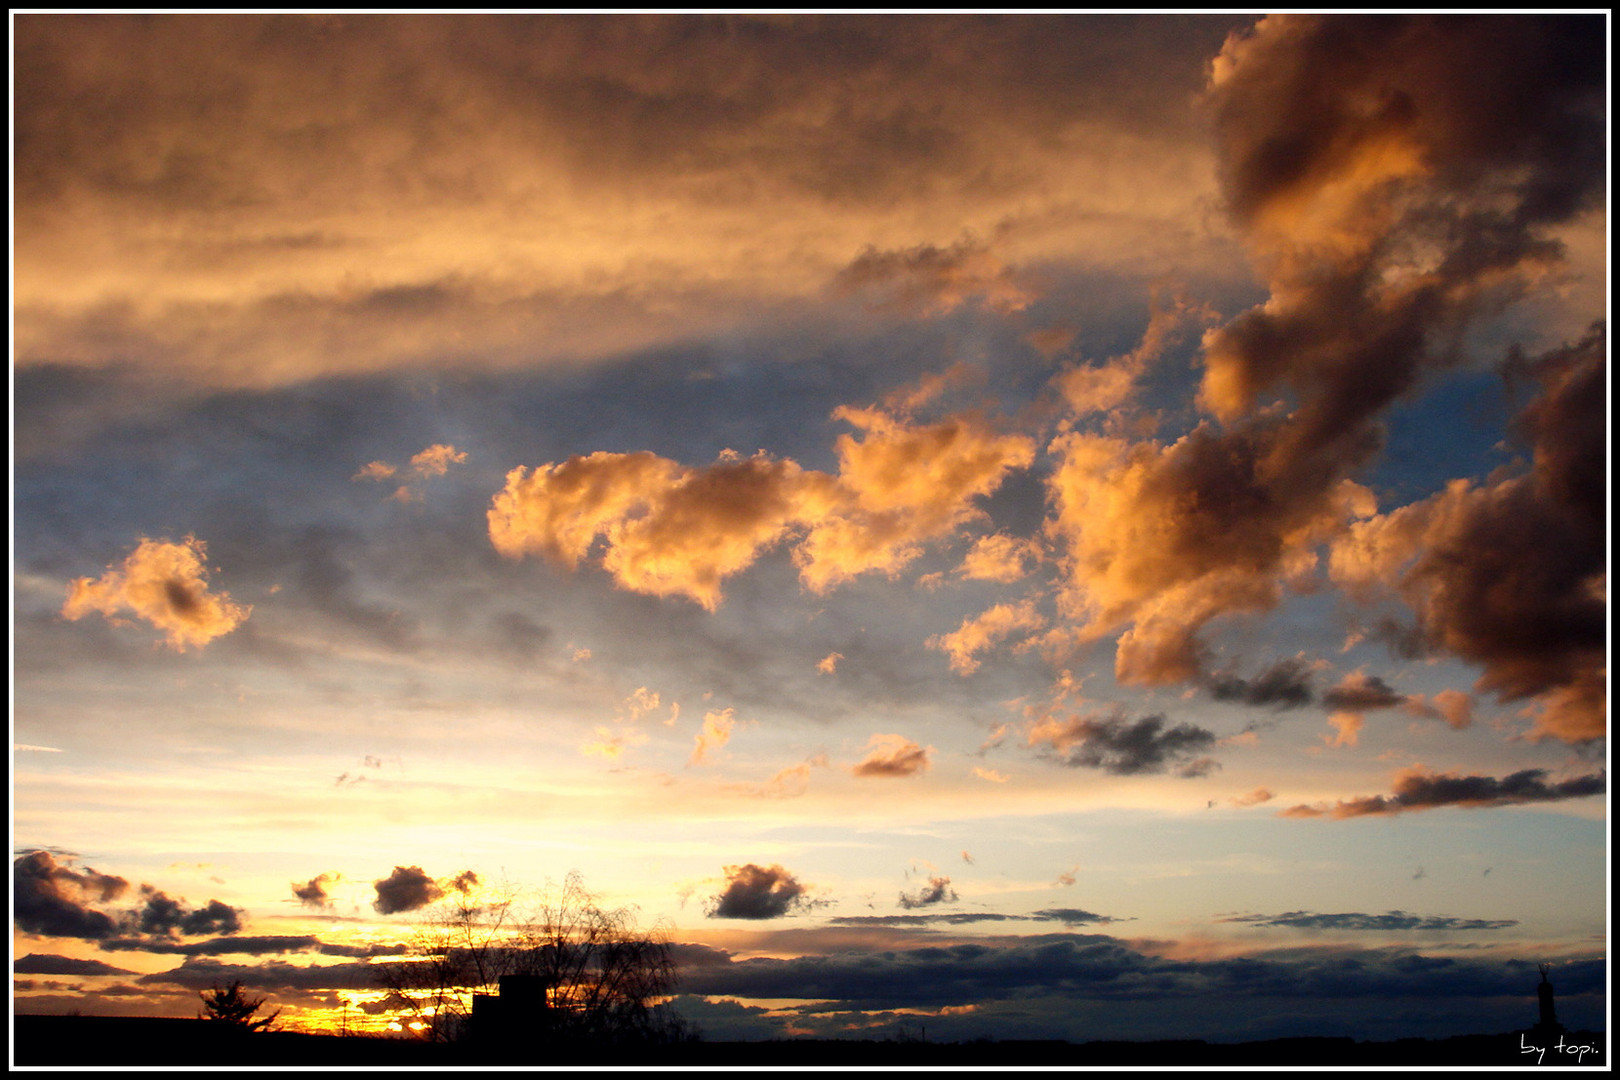 ein wundervoller Sonnenuntergang